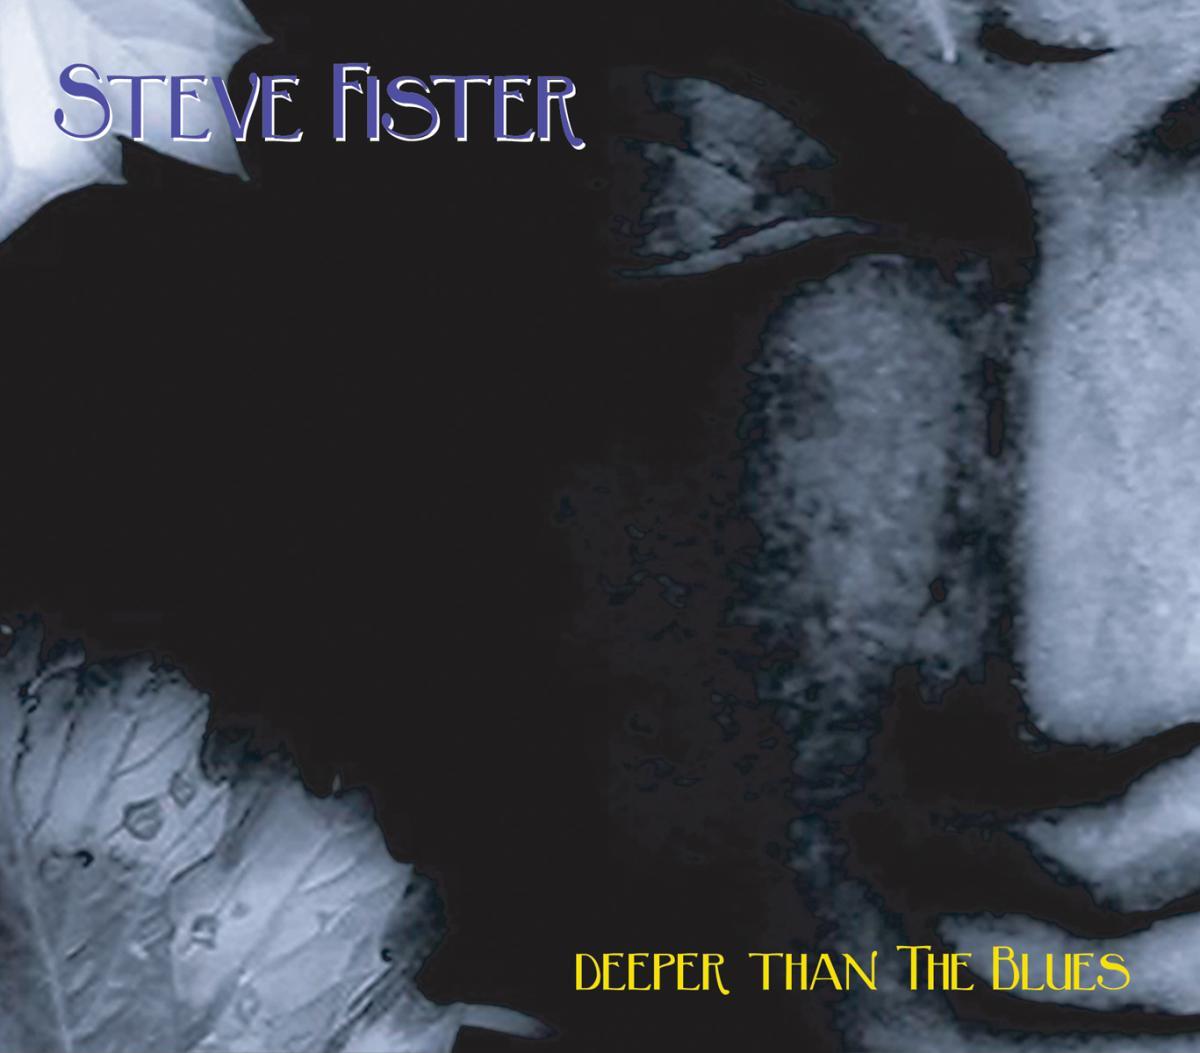 Стив Фистер Steve Fister. Deeper Than The Blues стив форберт steve forbert the place and time